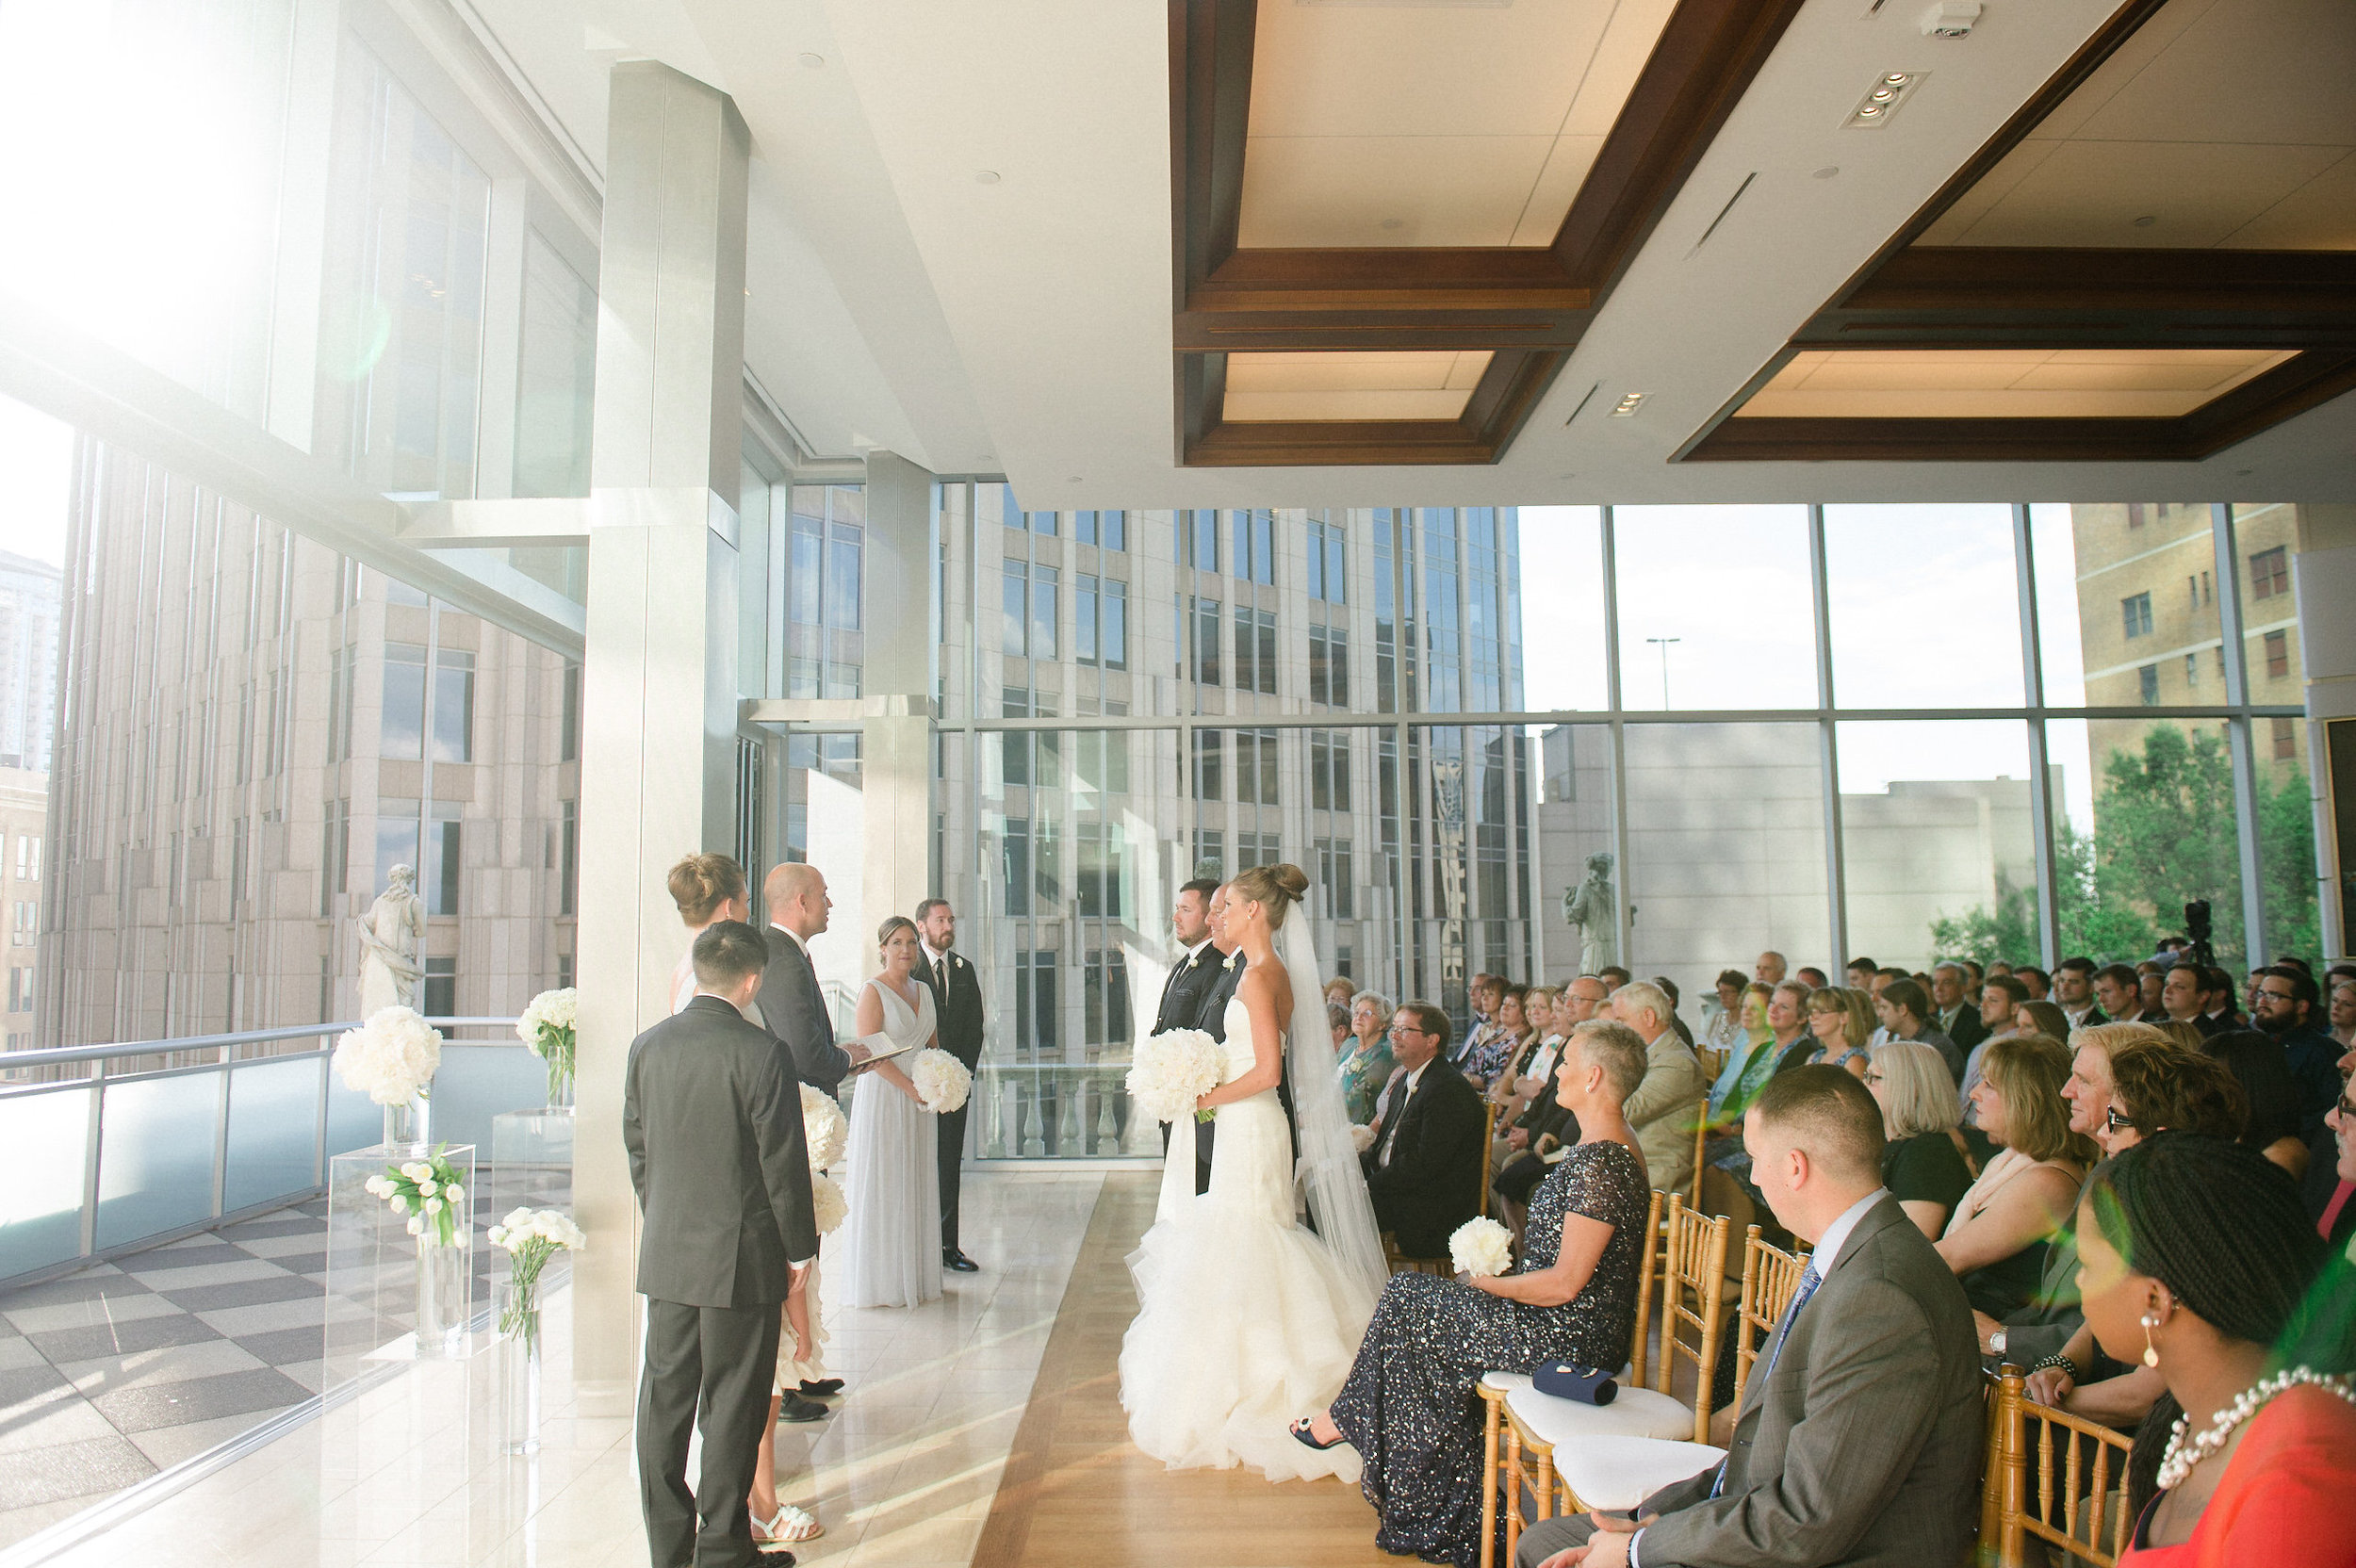 shelby&jordan|smitten&hooked|wedding|ceremony-067.jpg